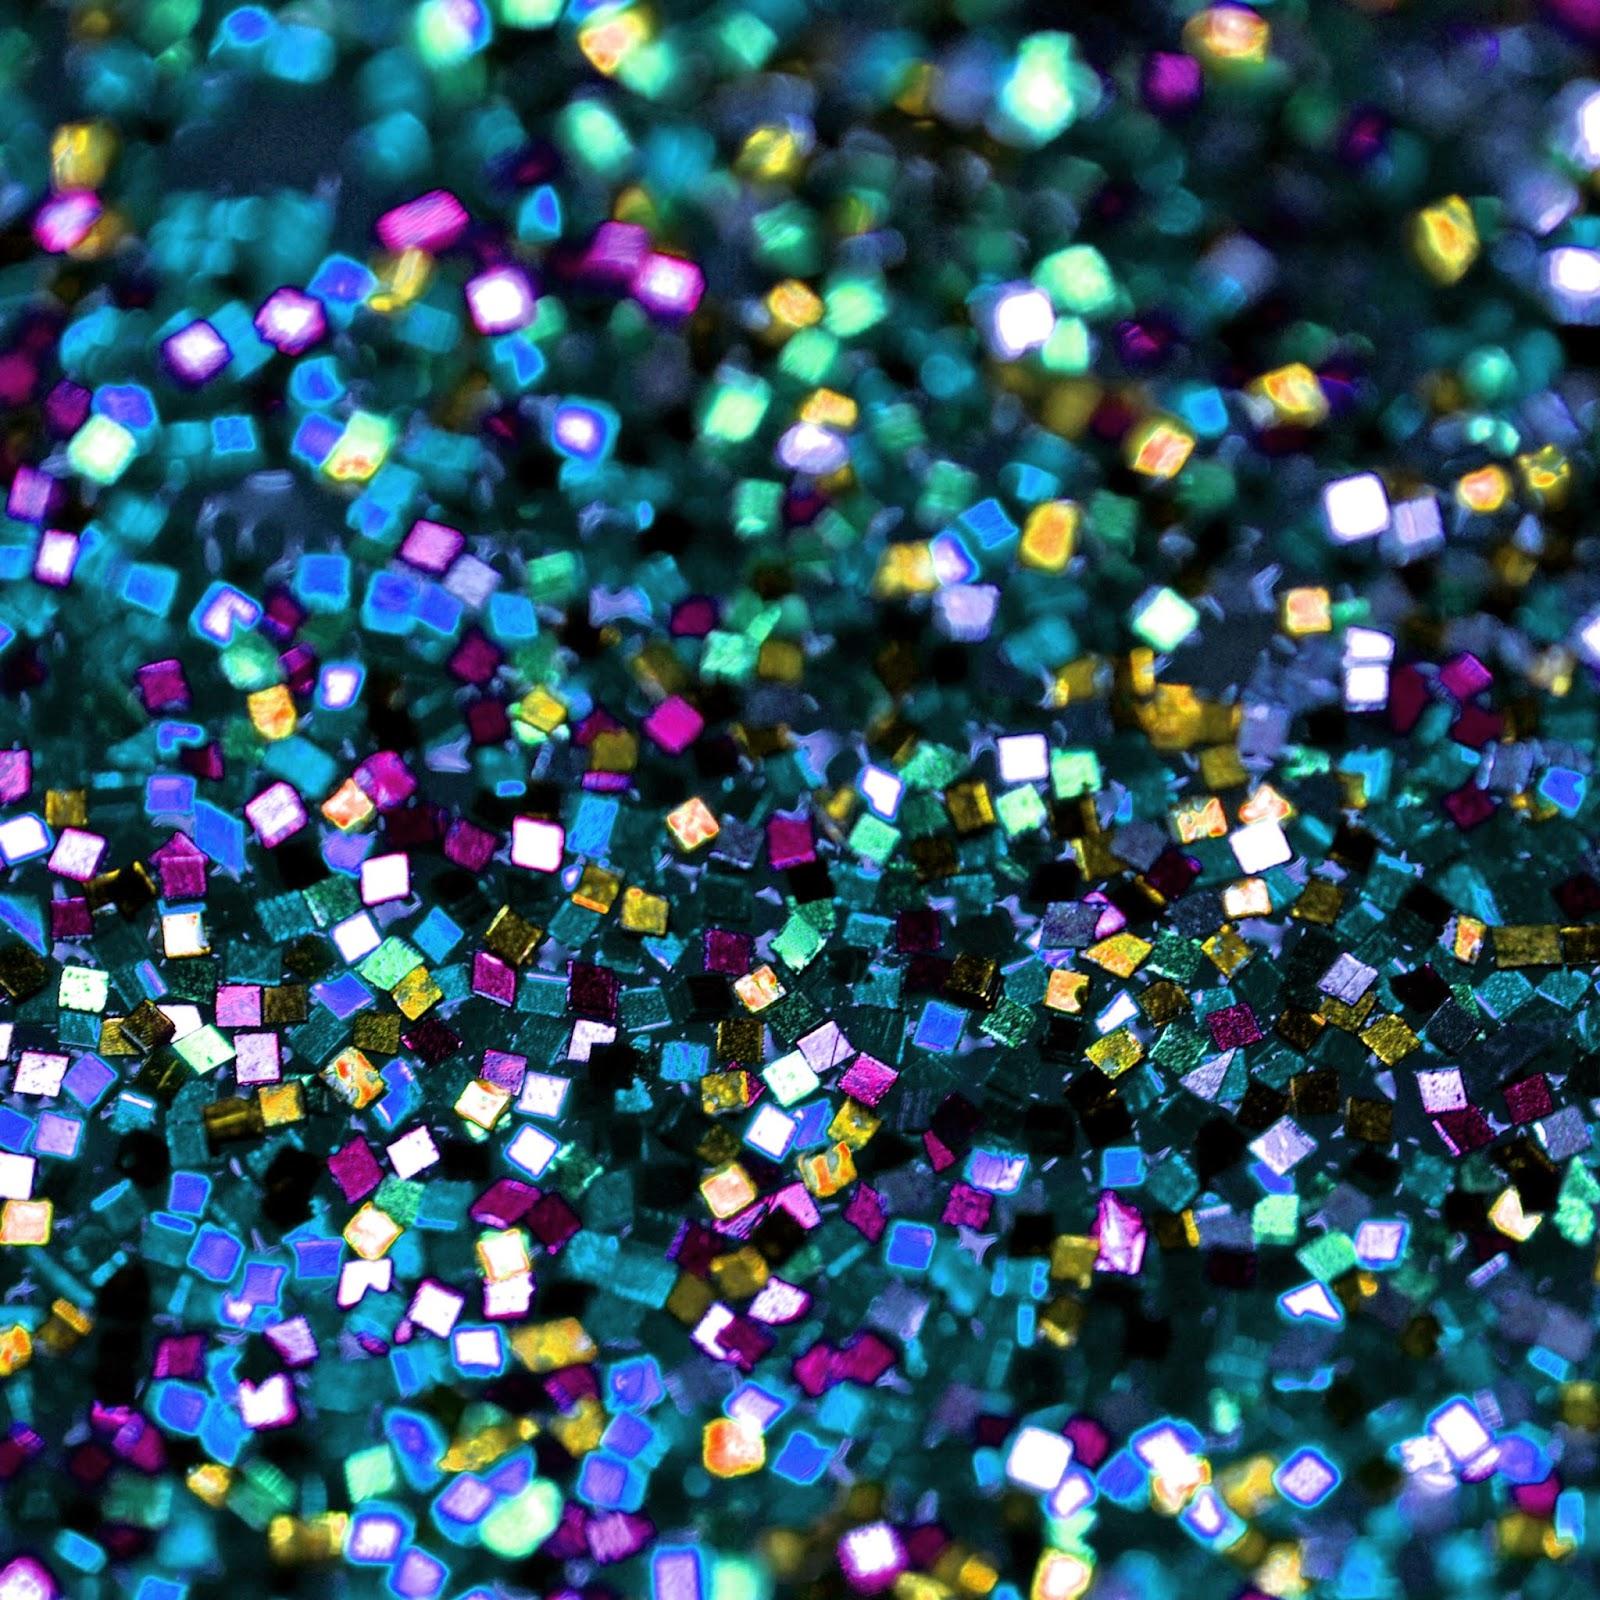 Falling Glitter Confetti Wallpapers Doodlecraft Multi Colored Square Glitter Background